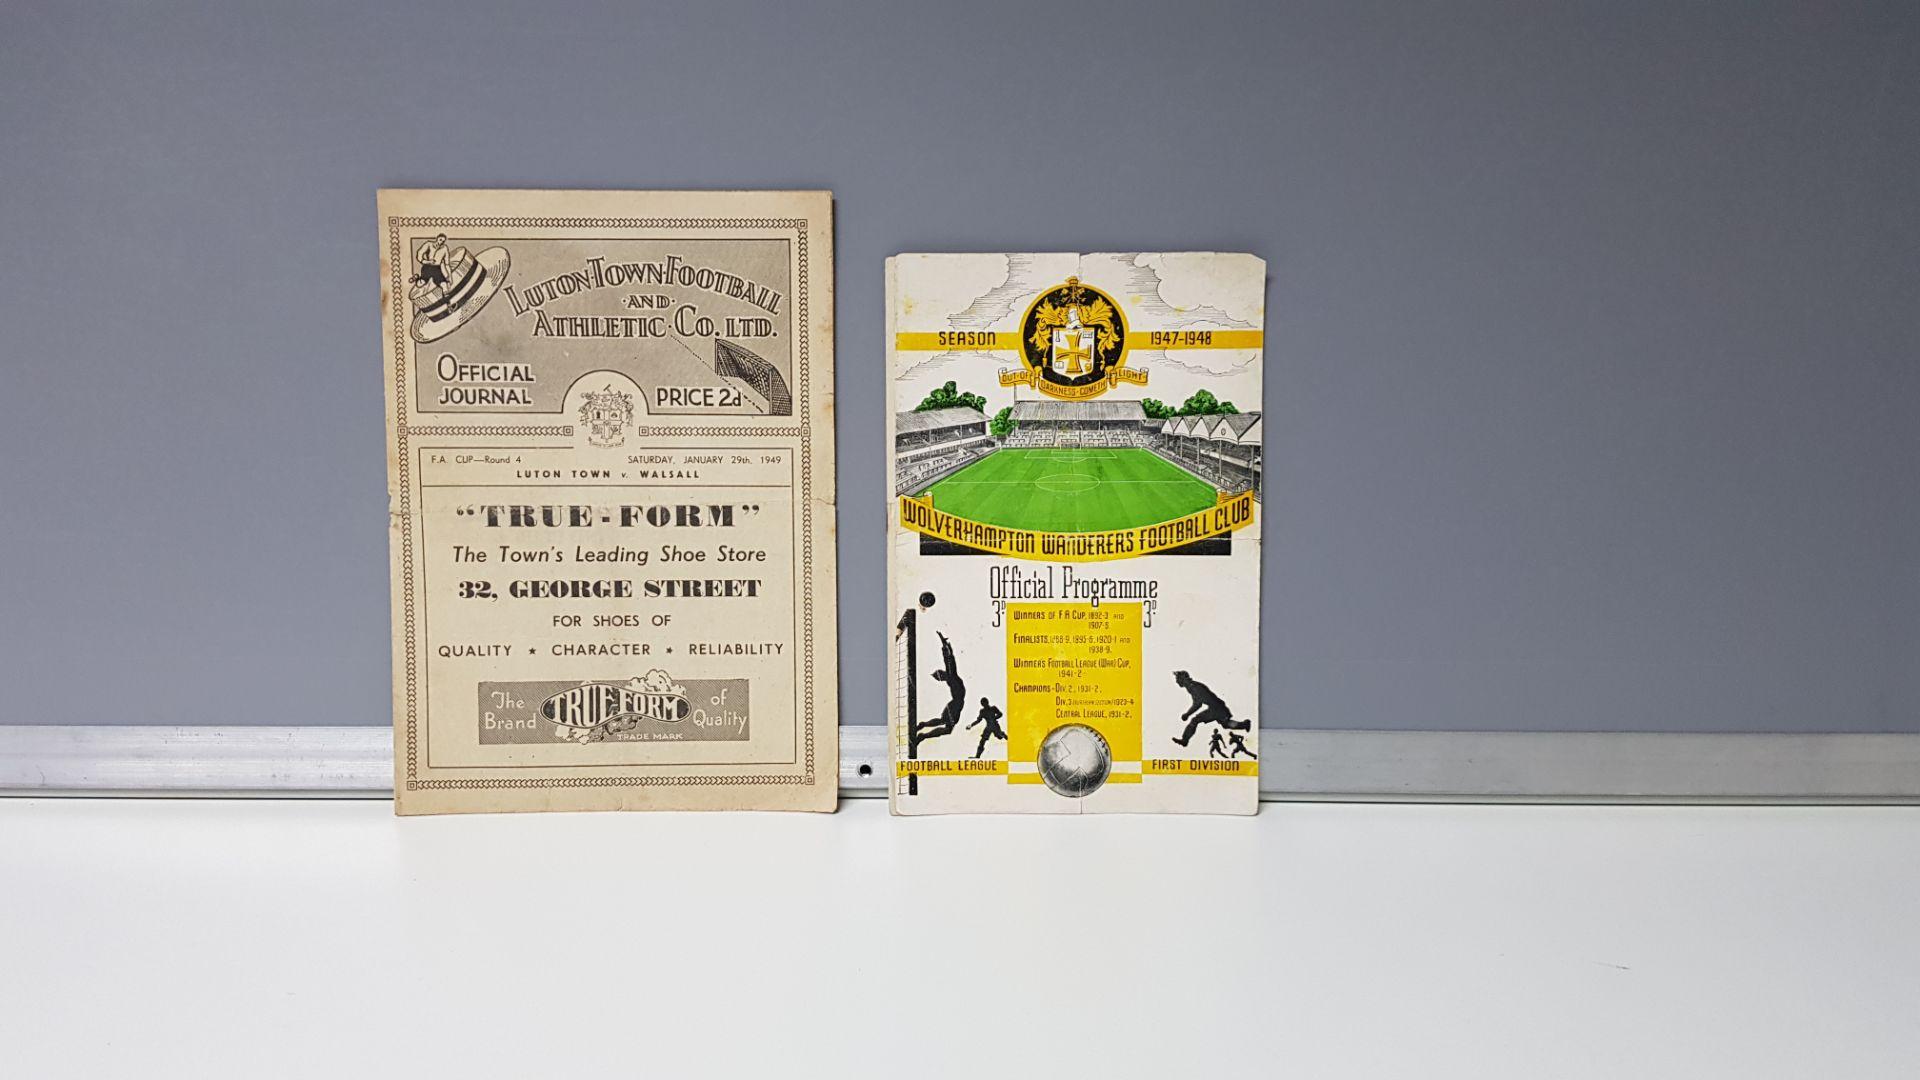 2 X OTHER PROGRAMMES - LUTON TOWN VS WALSALL SAT 29TH JAN 1949 & WOLVERHAMPTON WANDERERS VS